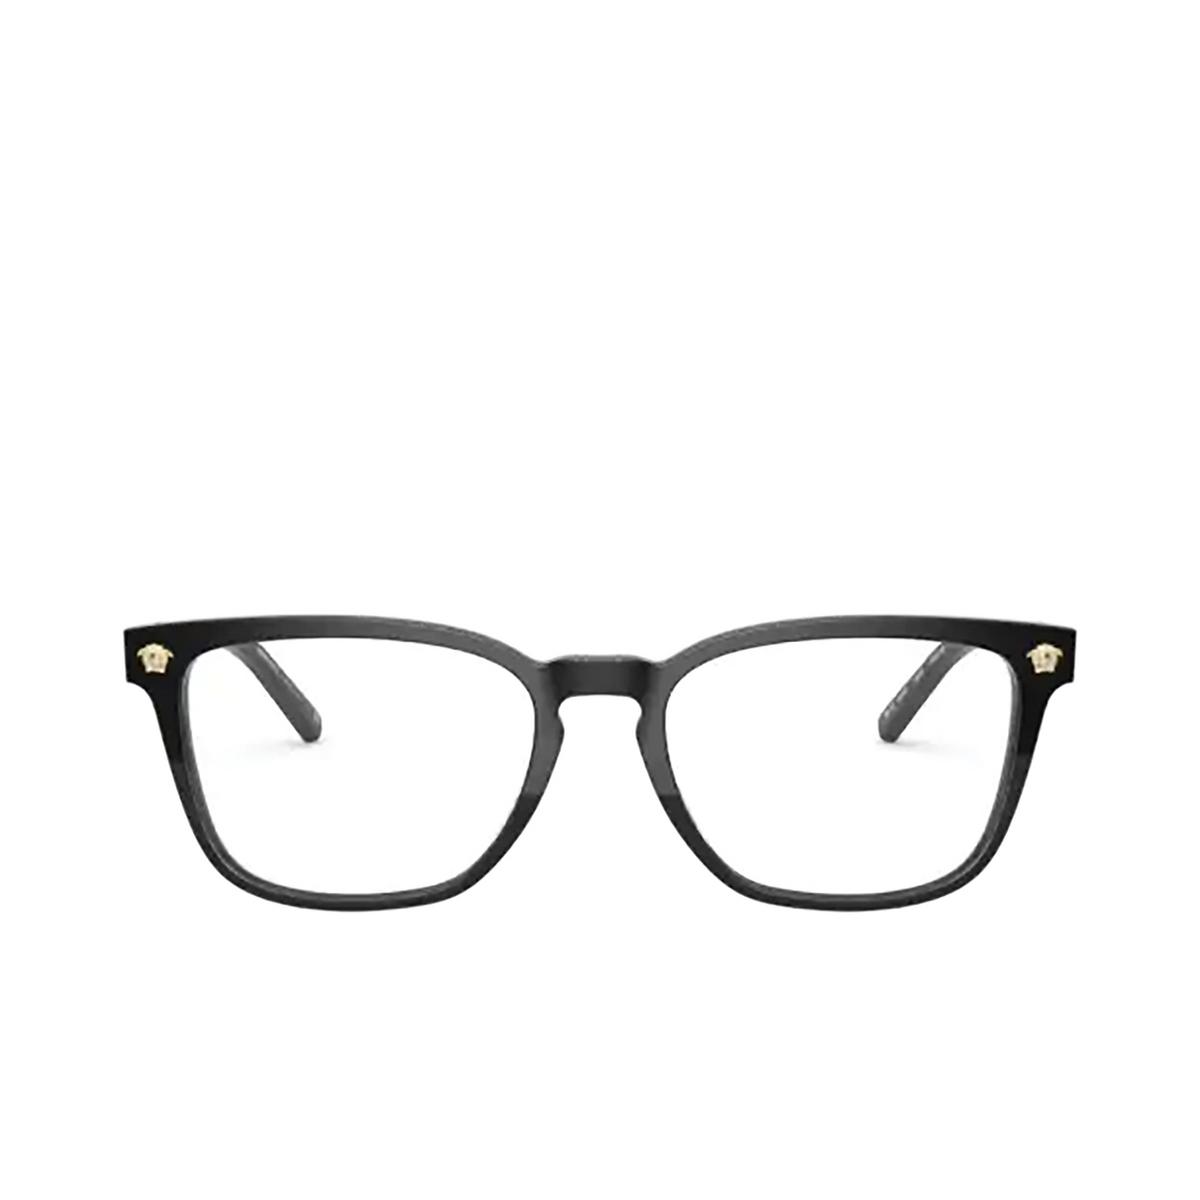 Versace® Rectangle Eyeglasses: VE3290 color Black GB1.